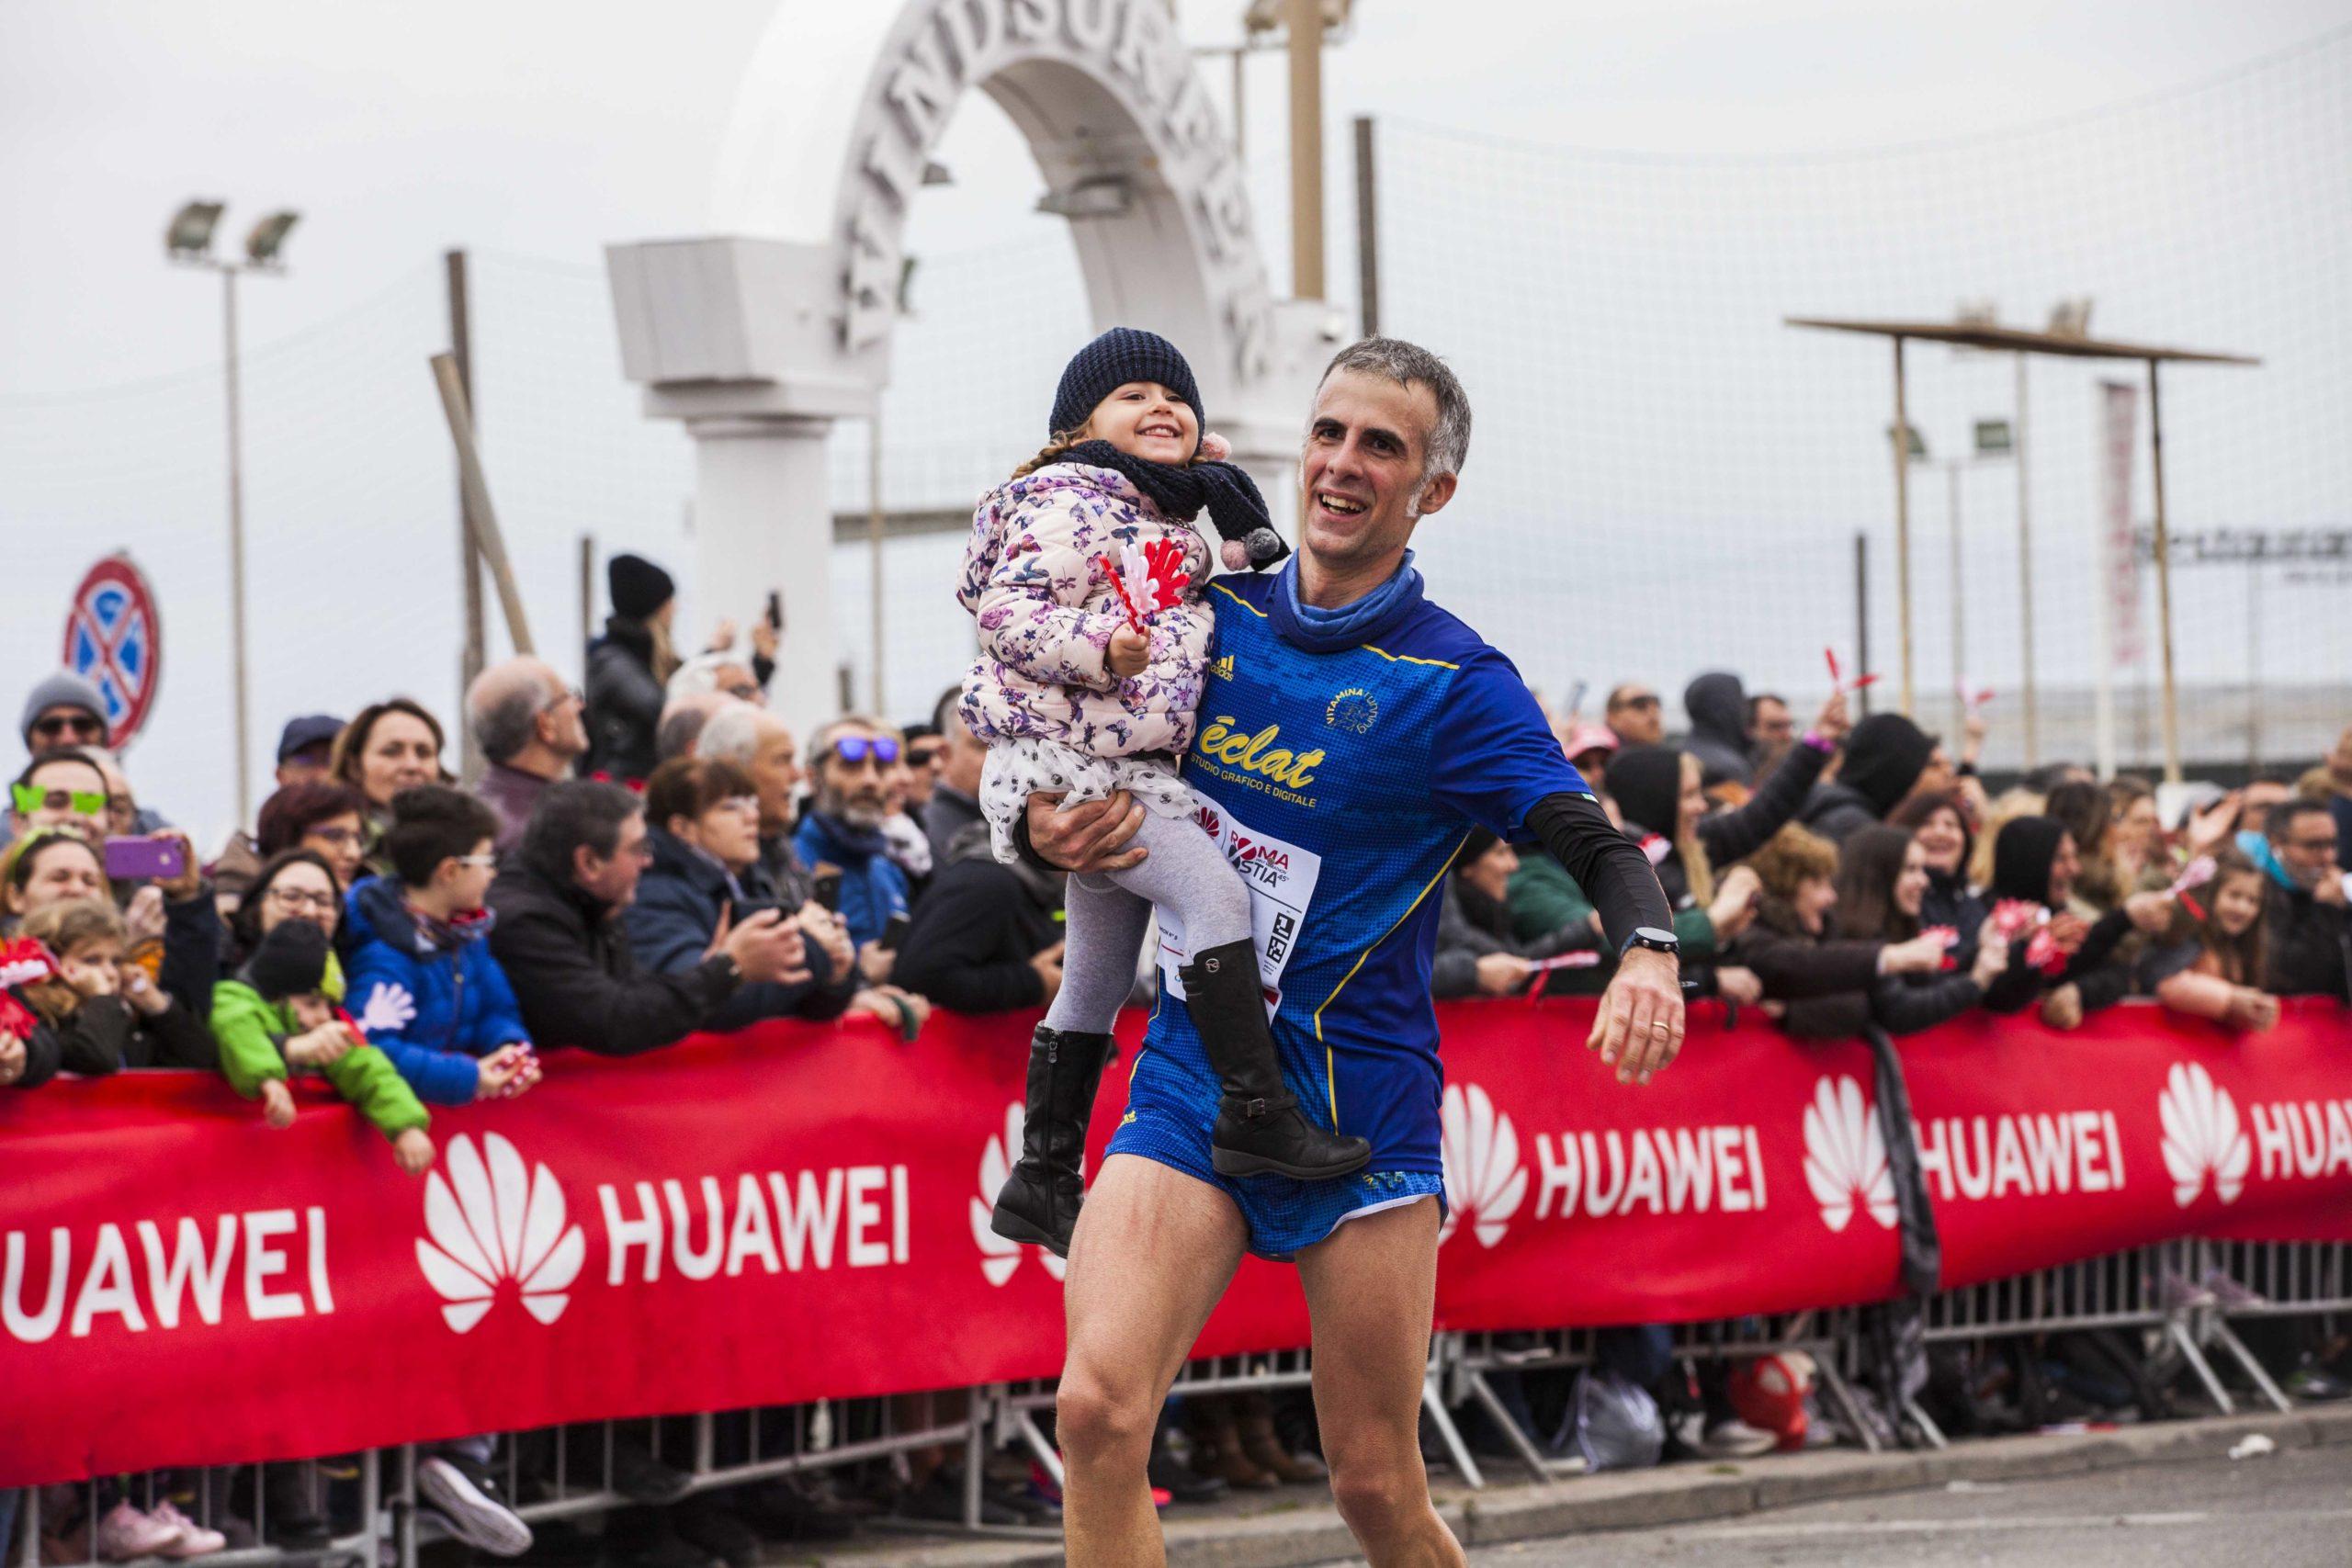 Huawei Marathons Padre e figlia per lo sport